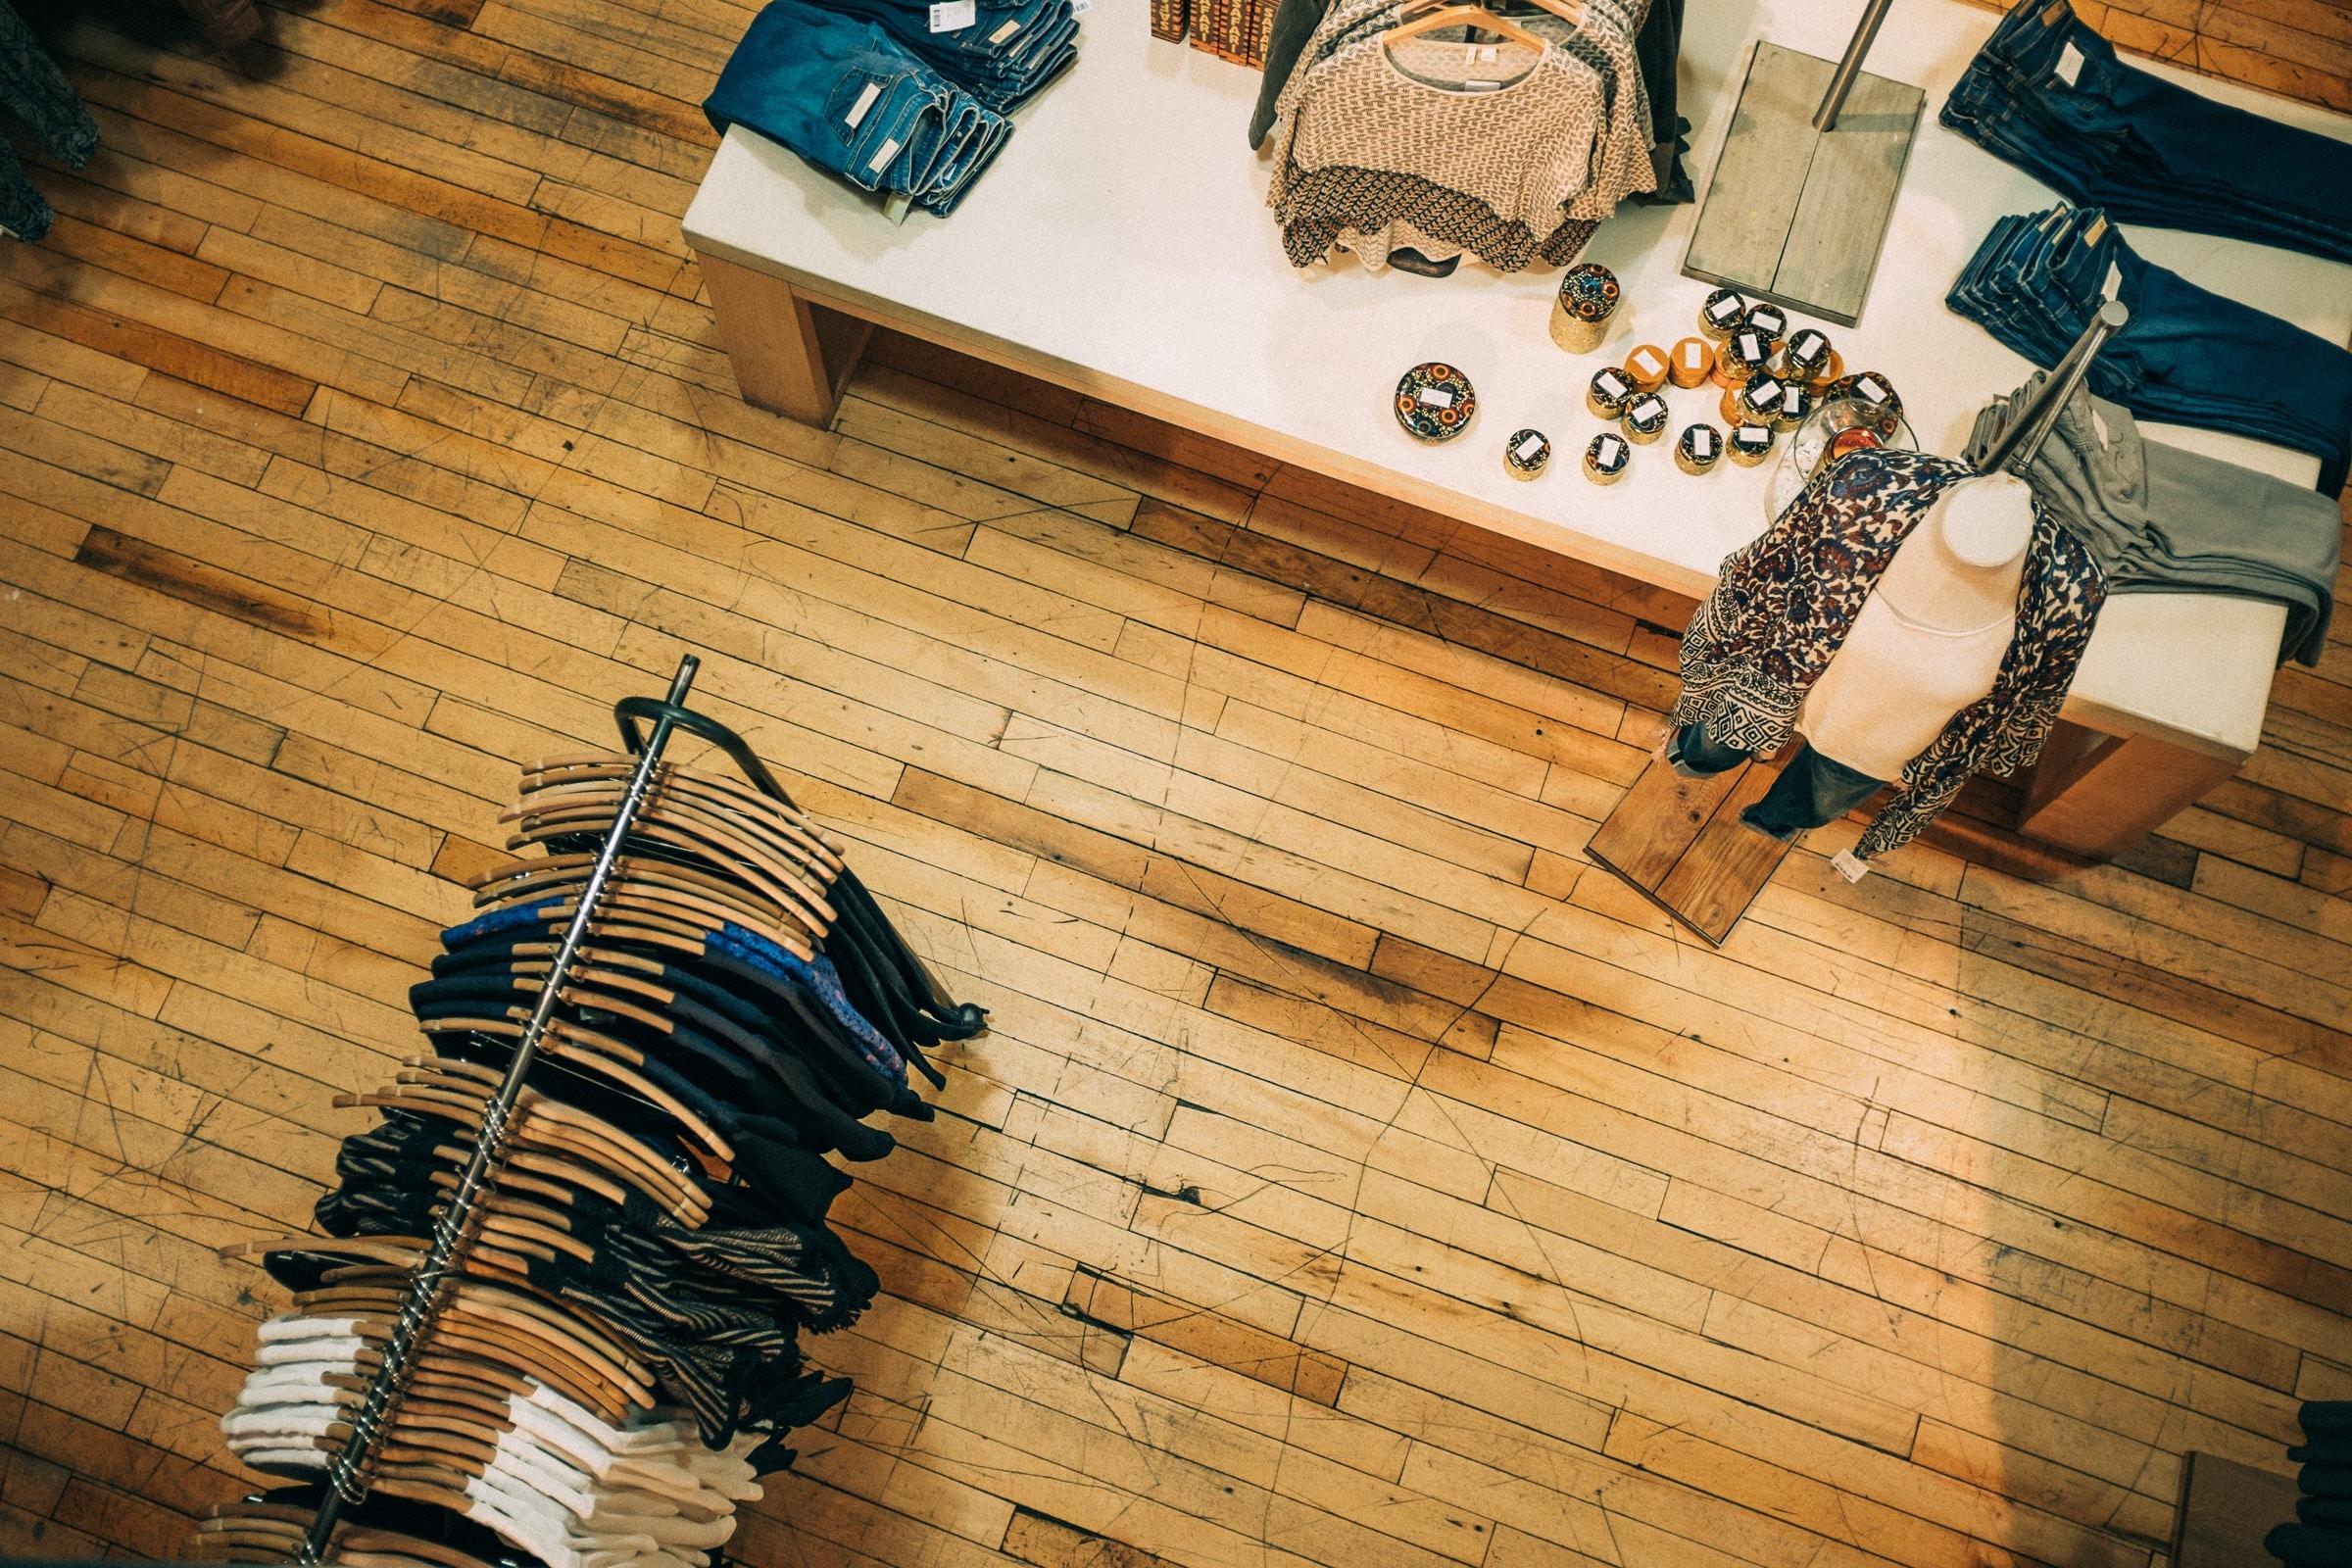 store_layout.jpg